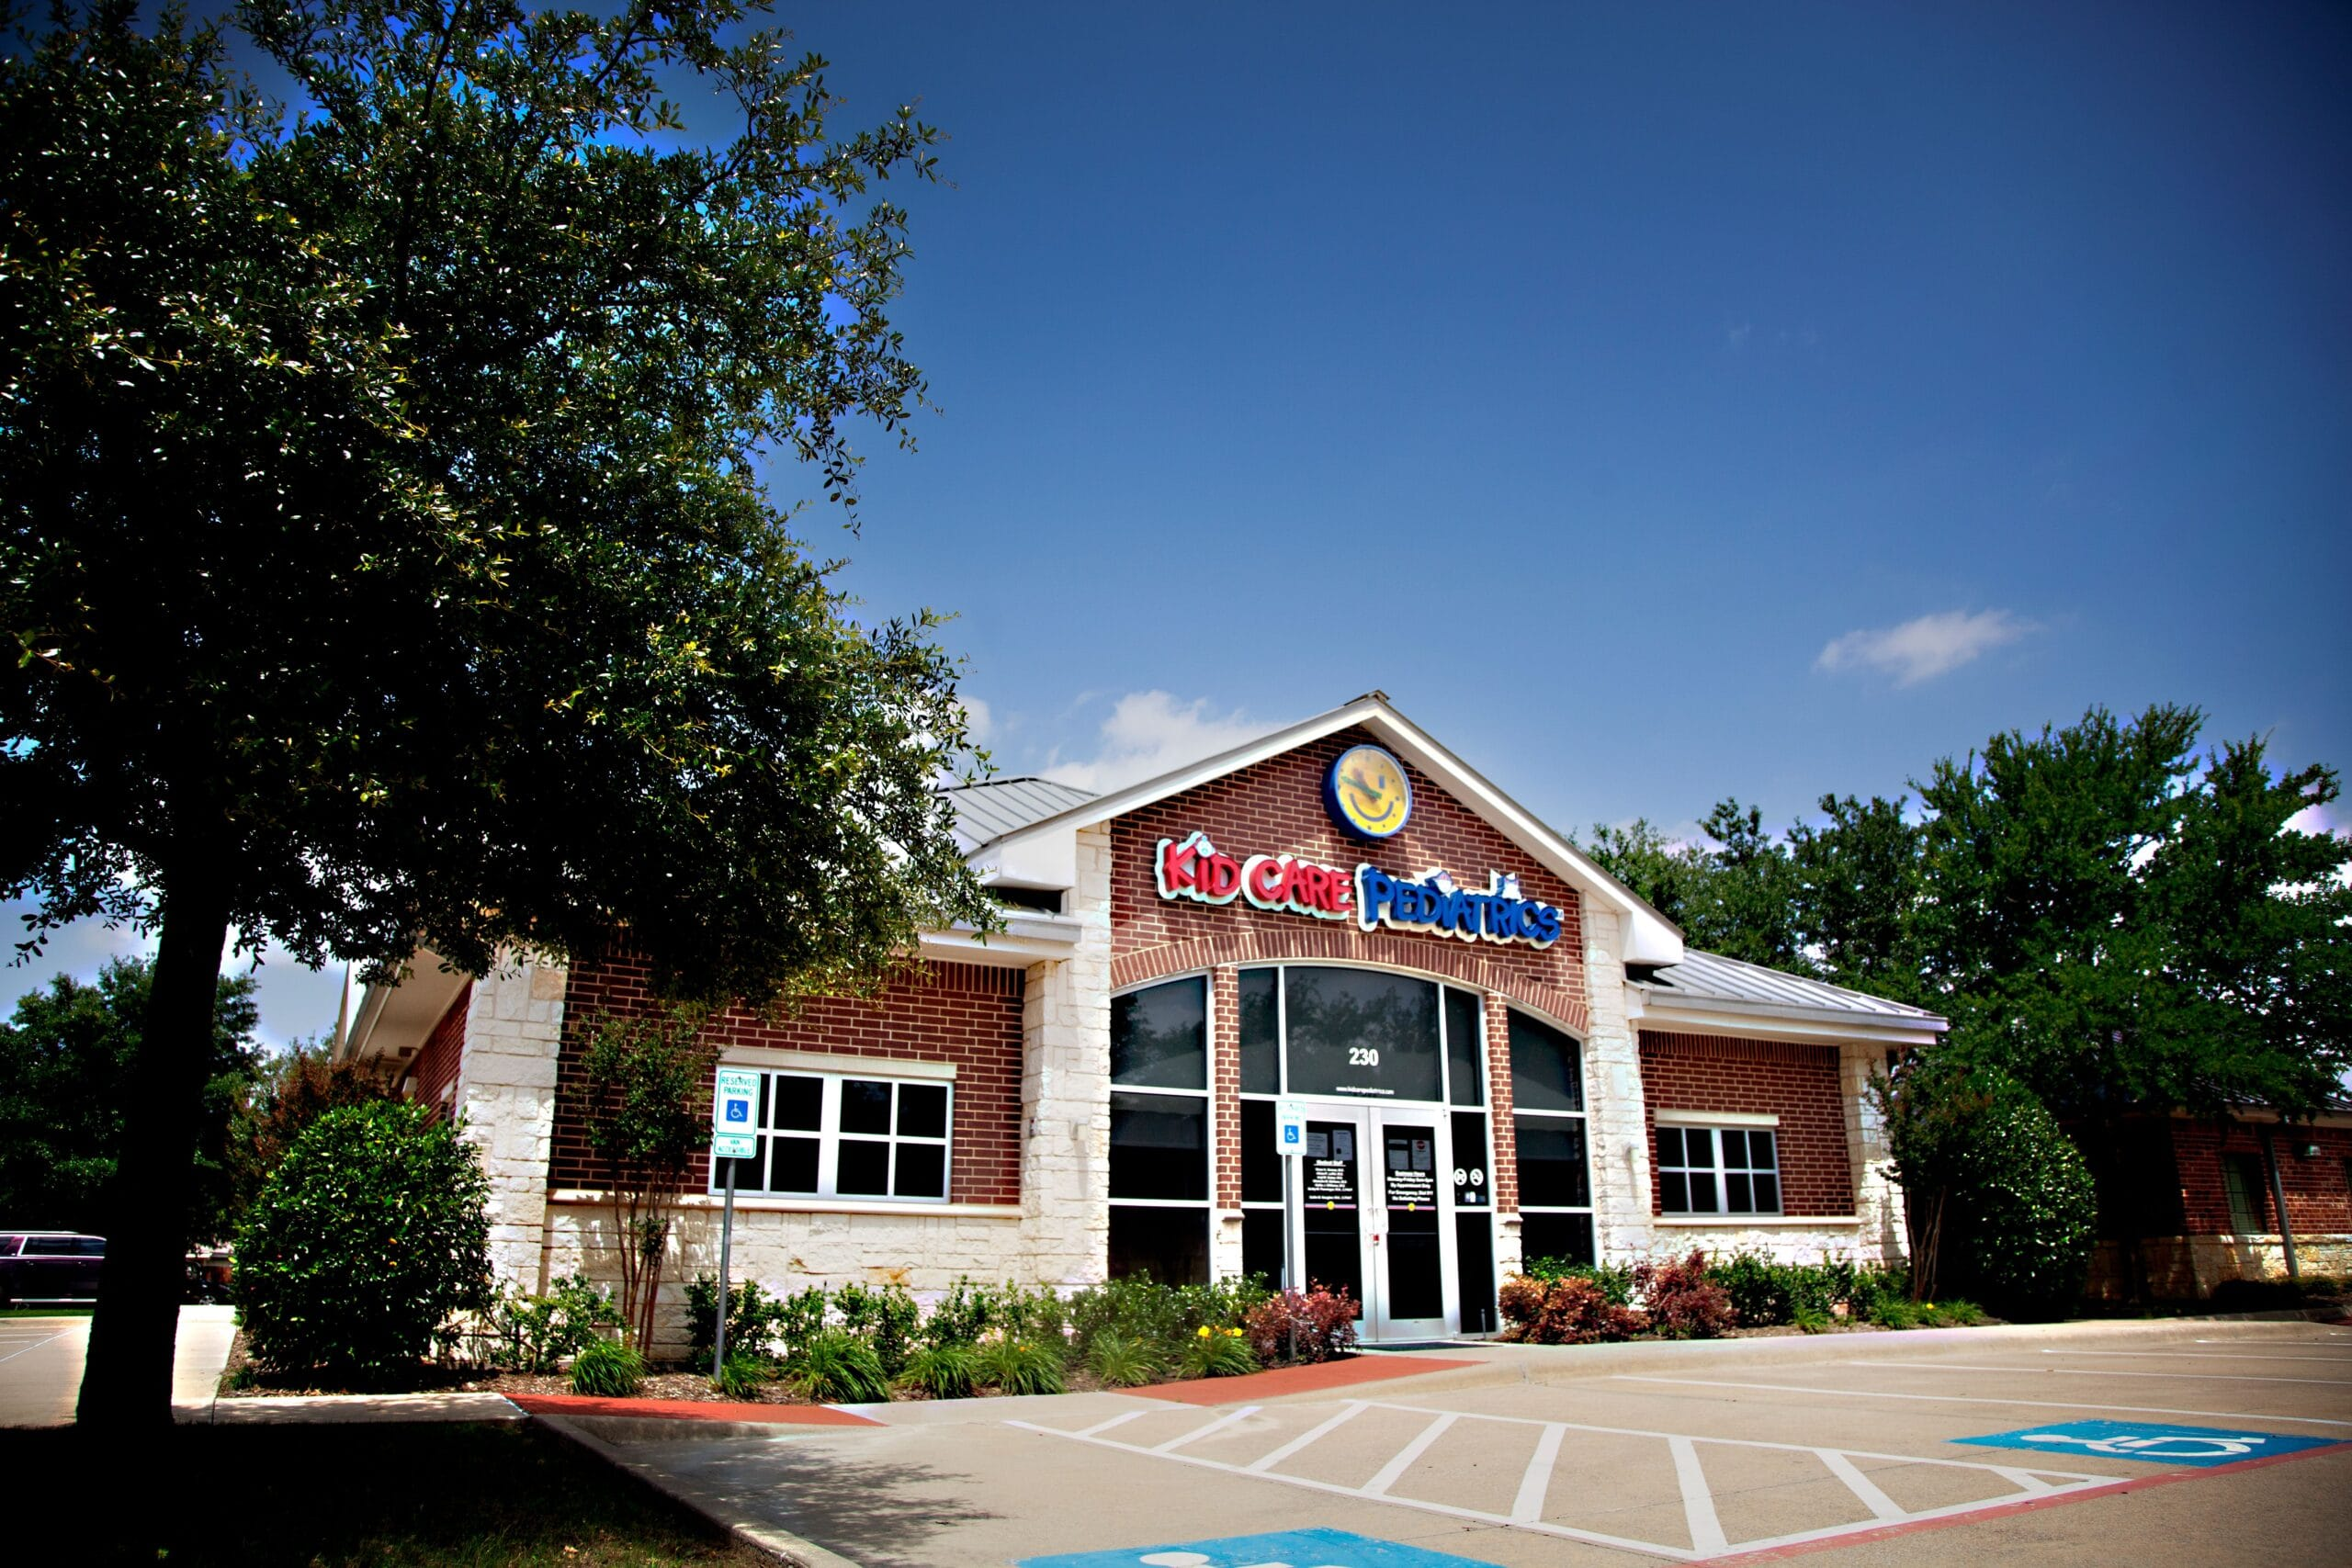 Kid Care Pediatrics office located in Keller, Texas